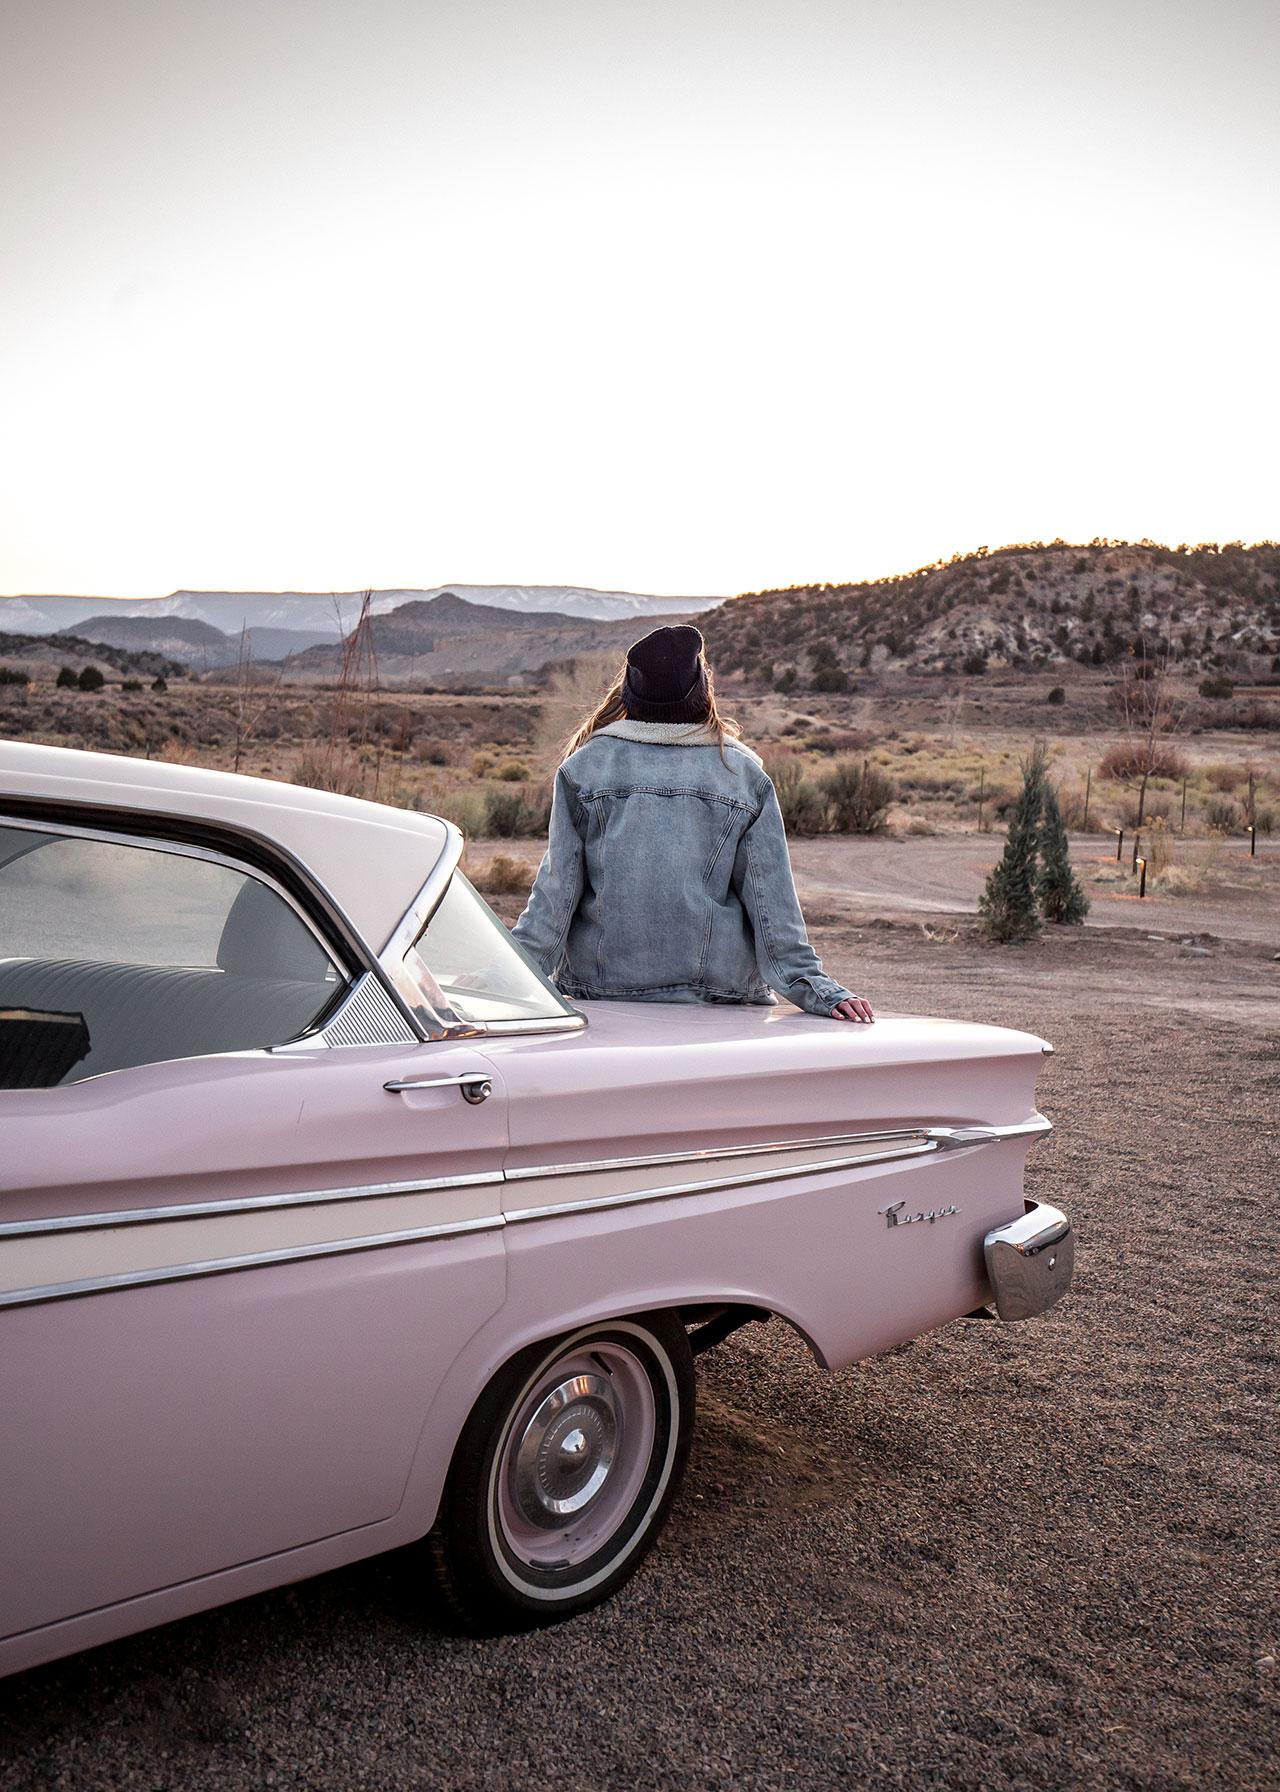 Photography by Aleks Danielle Butman.